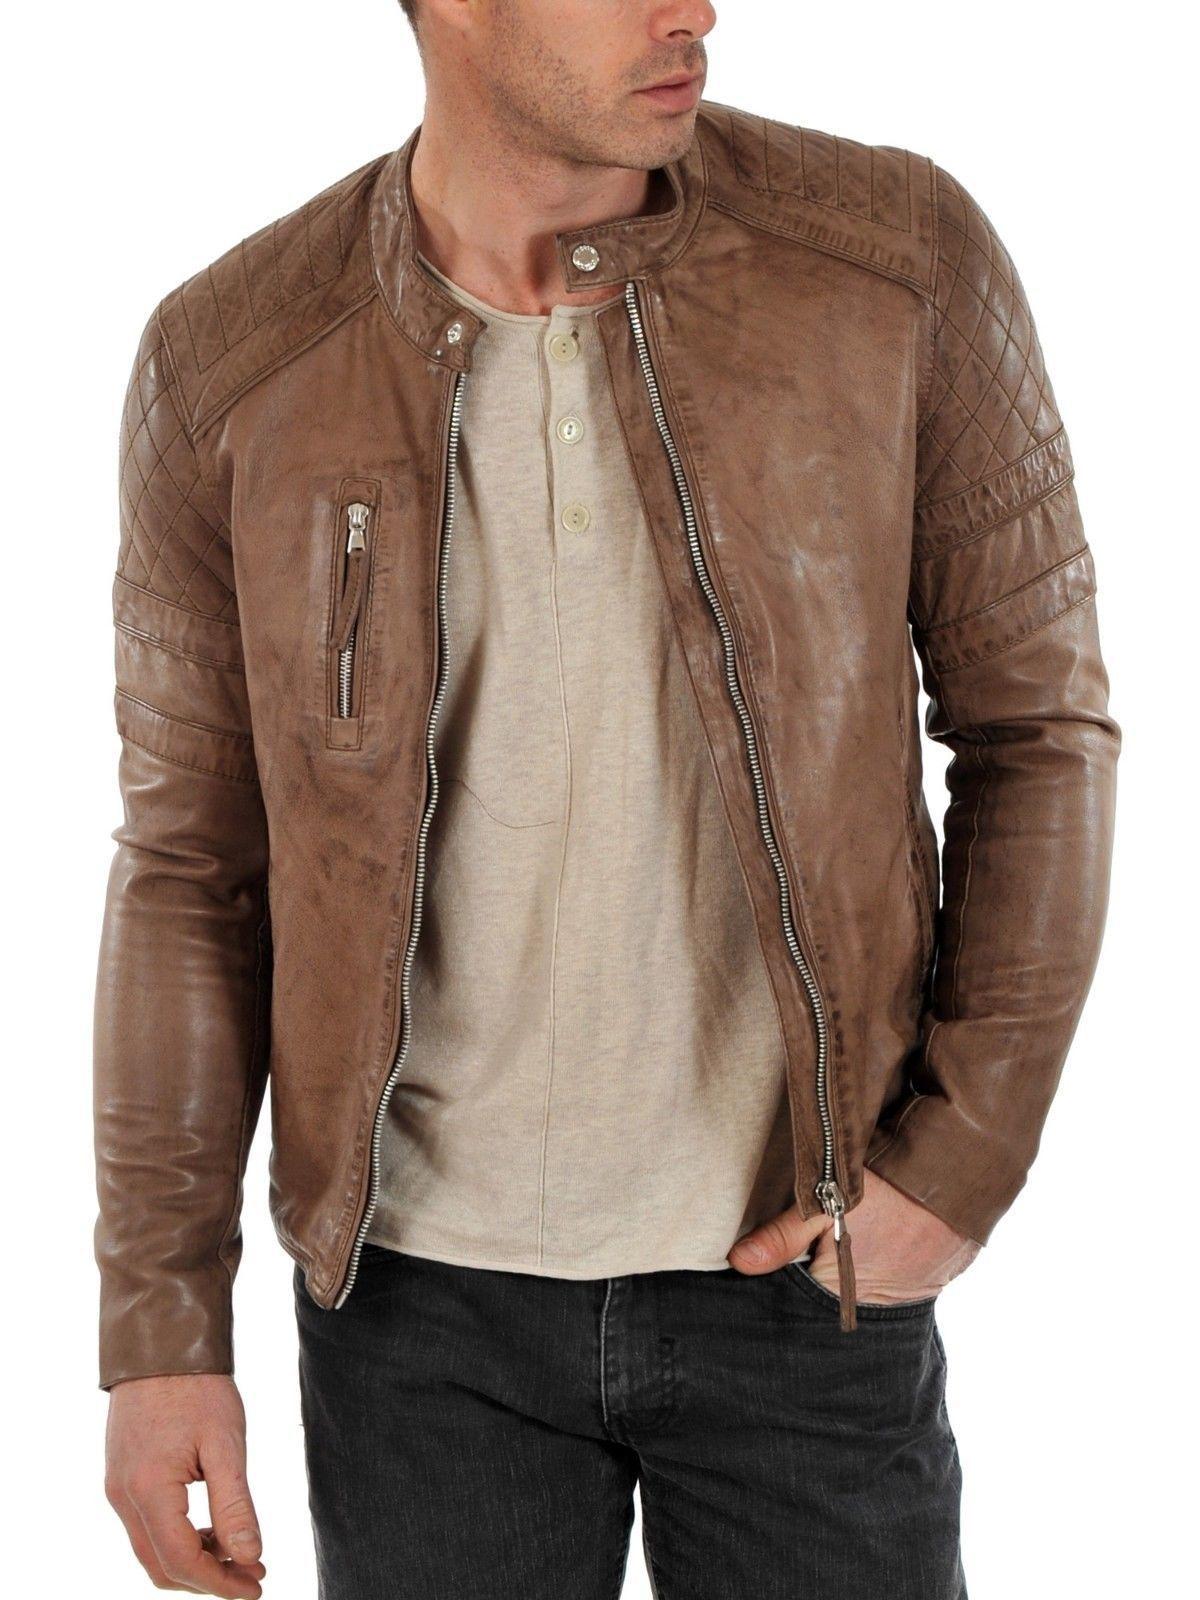 New Handmade Long Bomber Stylish Leather Jacket Uniqueleatherjacket Bomberstyleleatherjacket Graylel Leather Jacket Leather Jacket Style Fitted Biker Jacket [ 1600 x 1200 Pixel ]